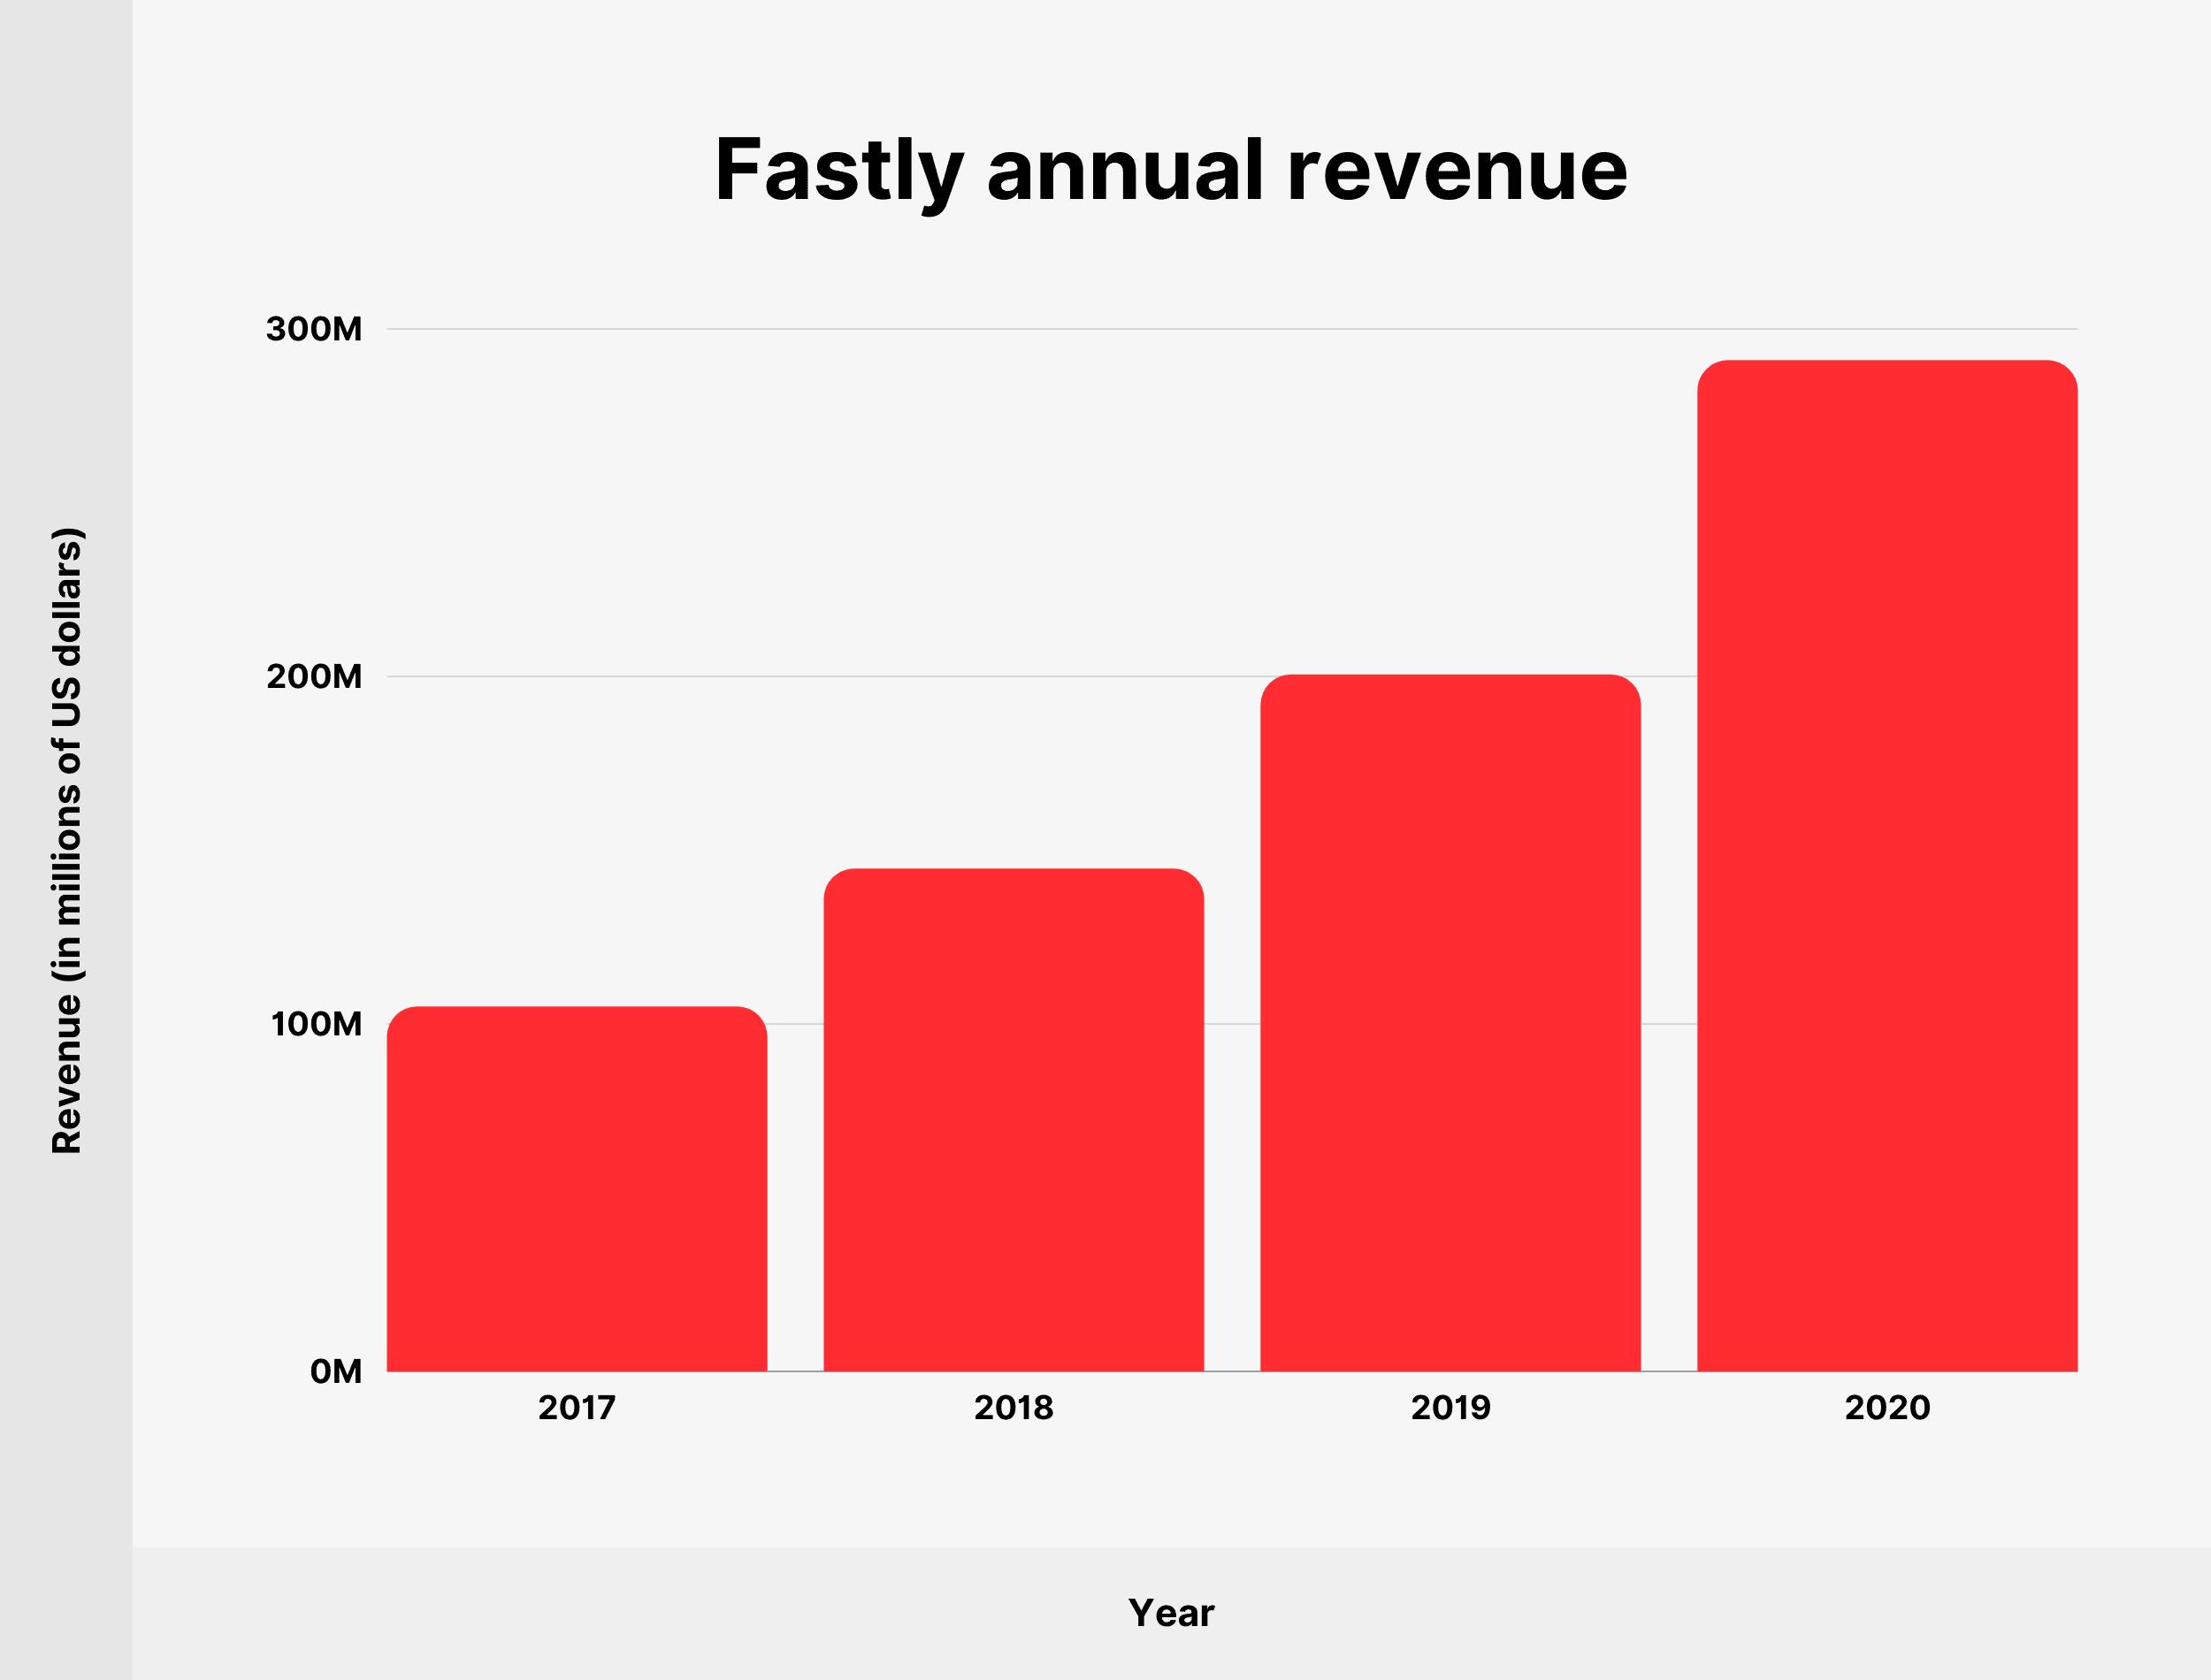 Fastly annual revenue